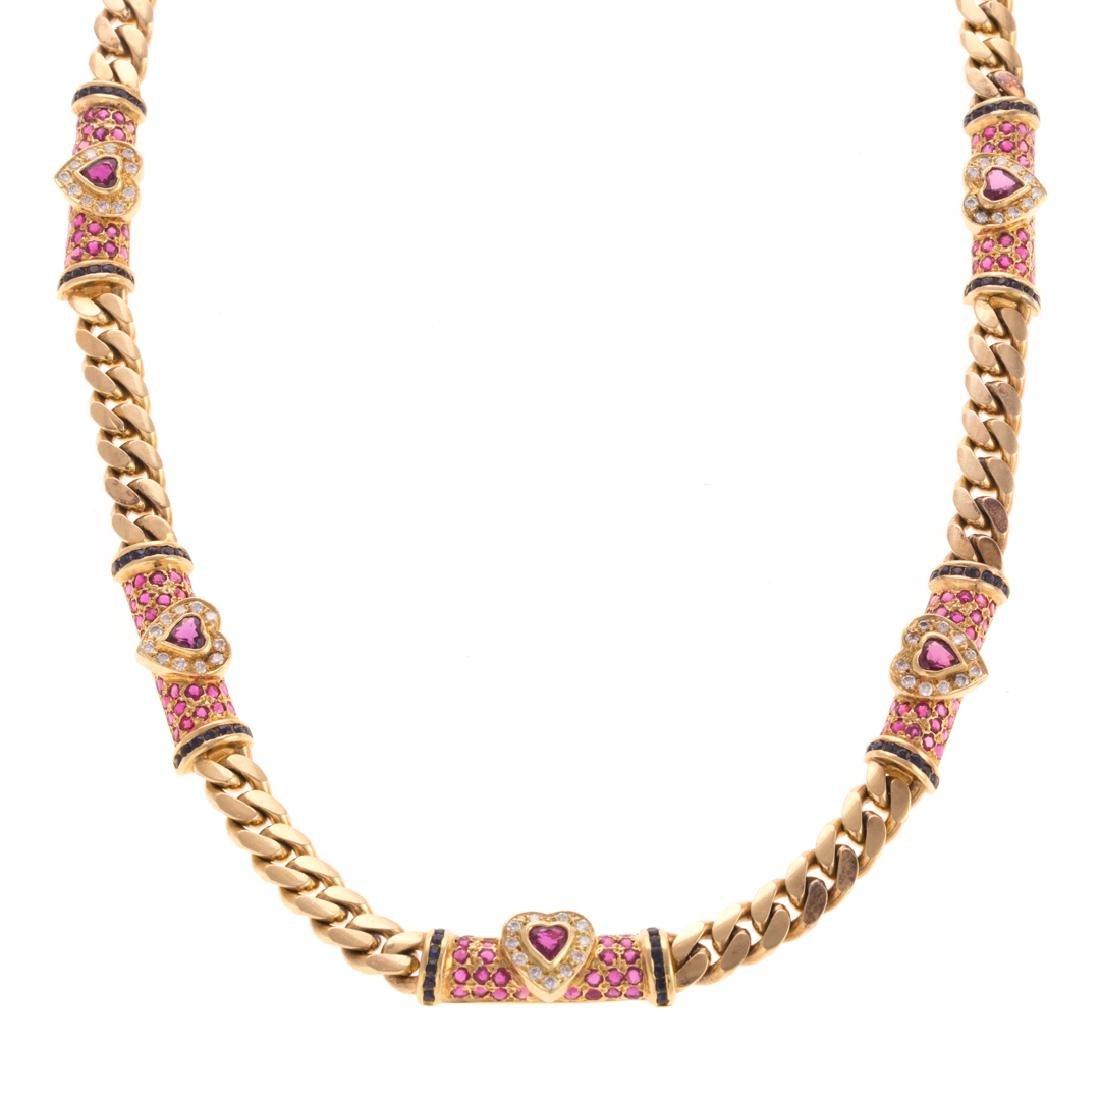 A Heavy Ruby & Diamond Necklace in 18K